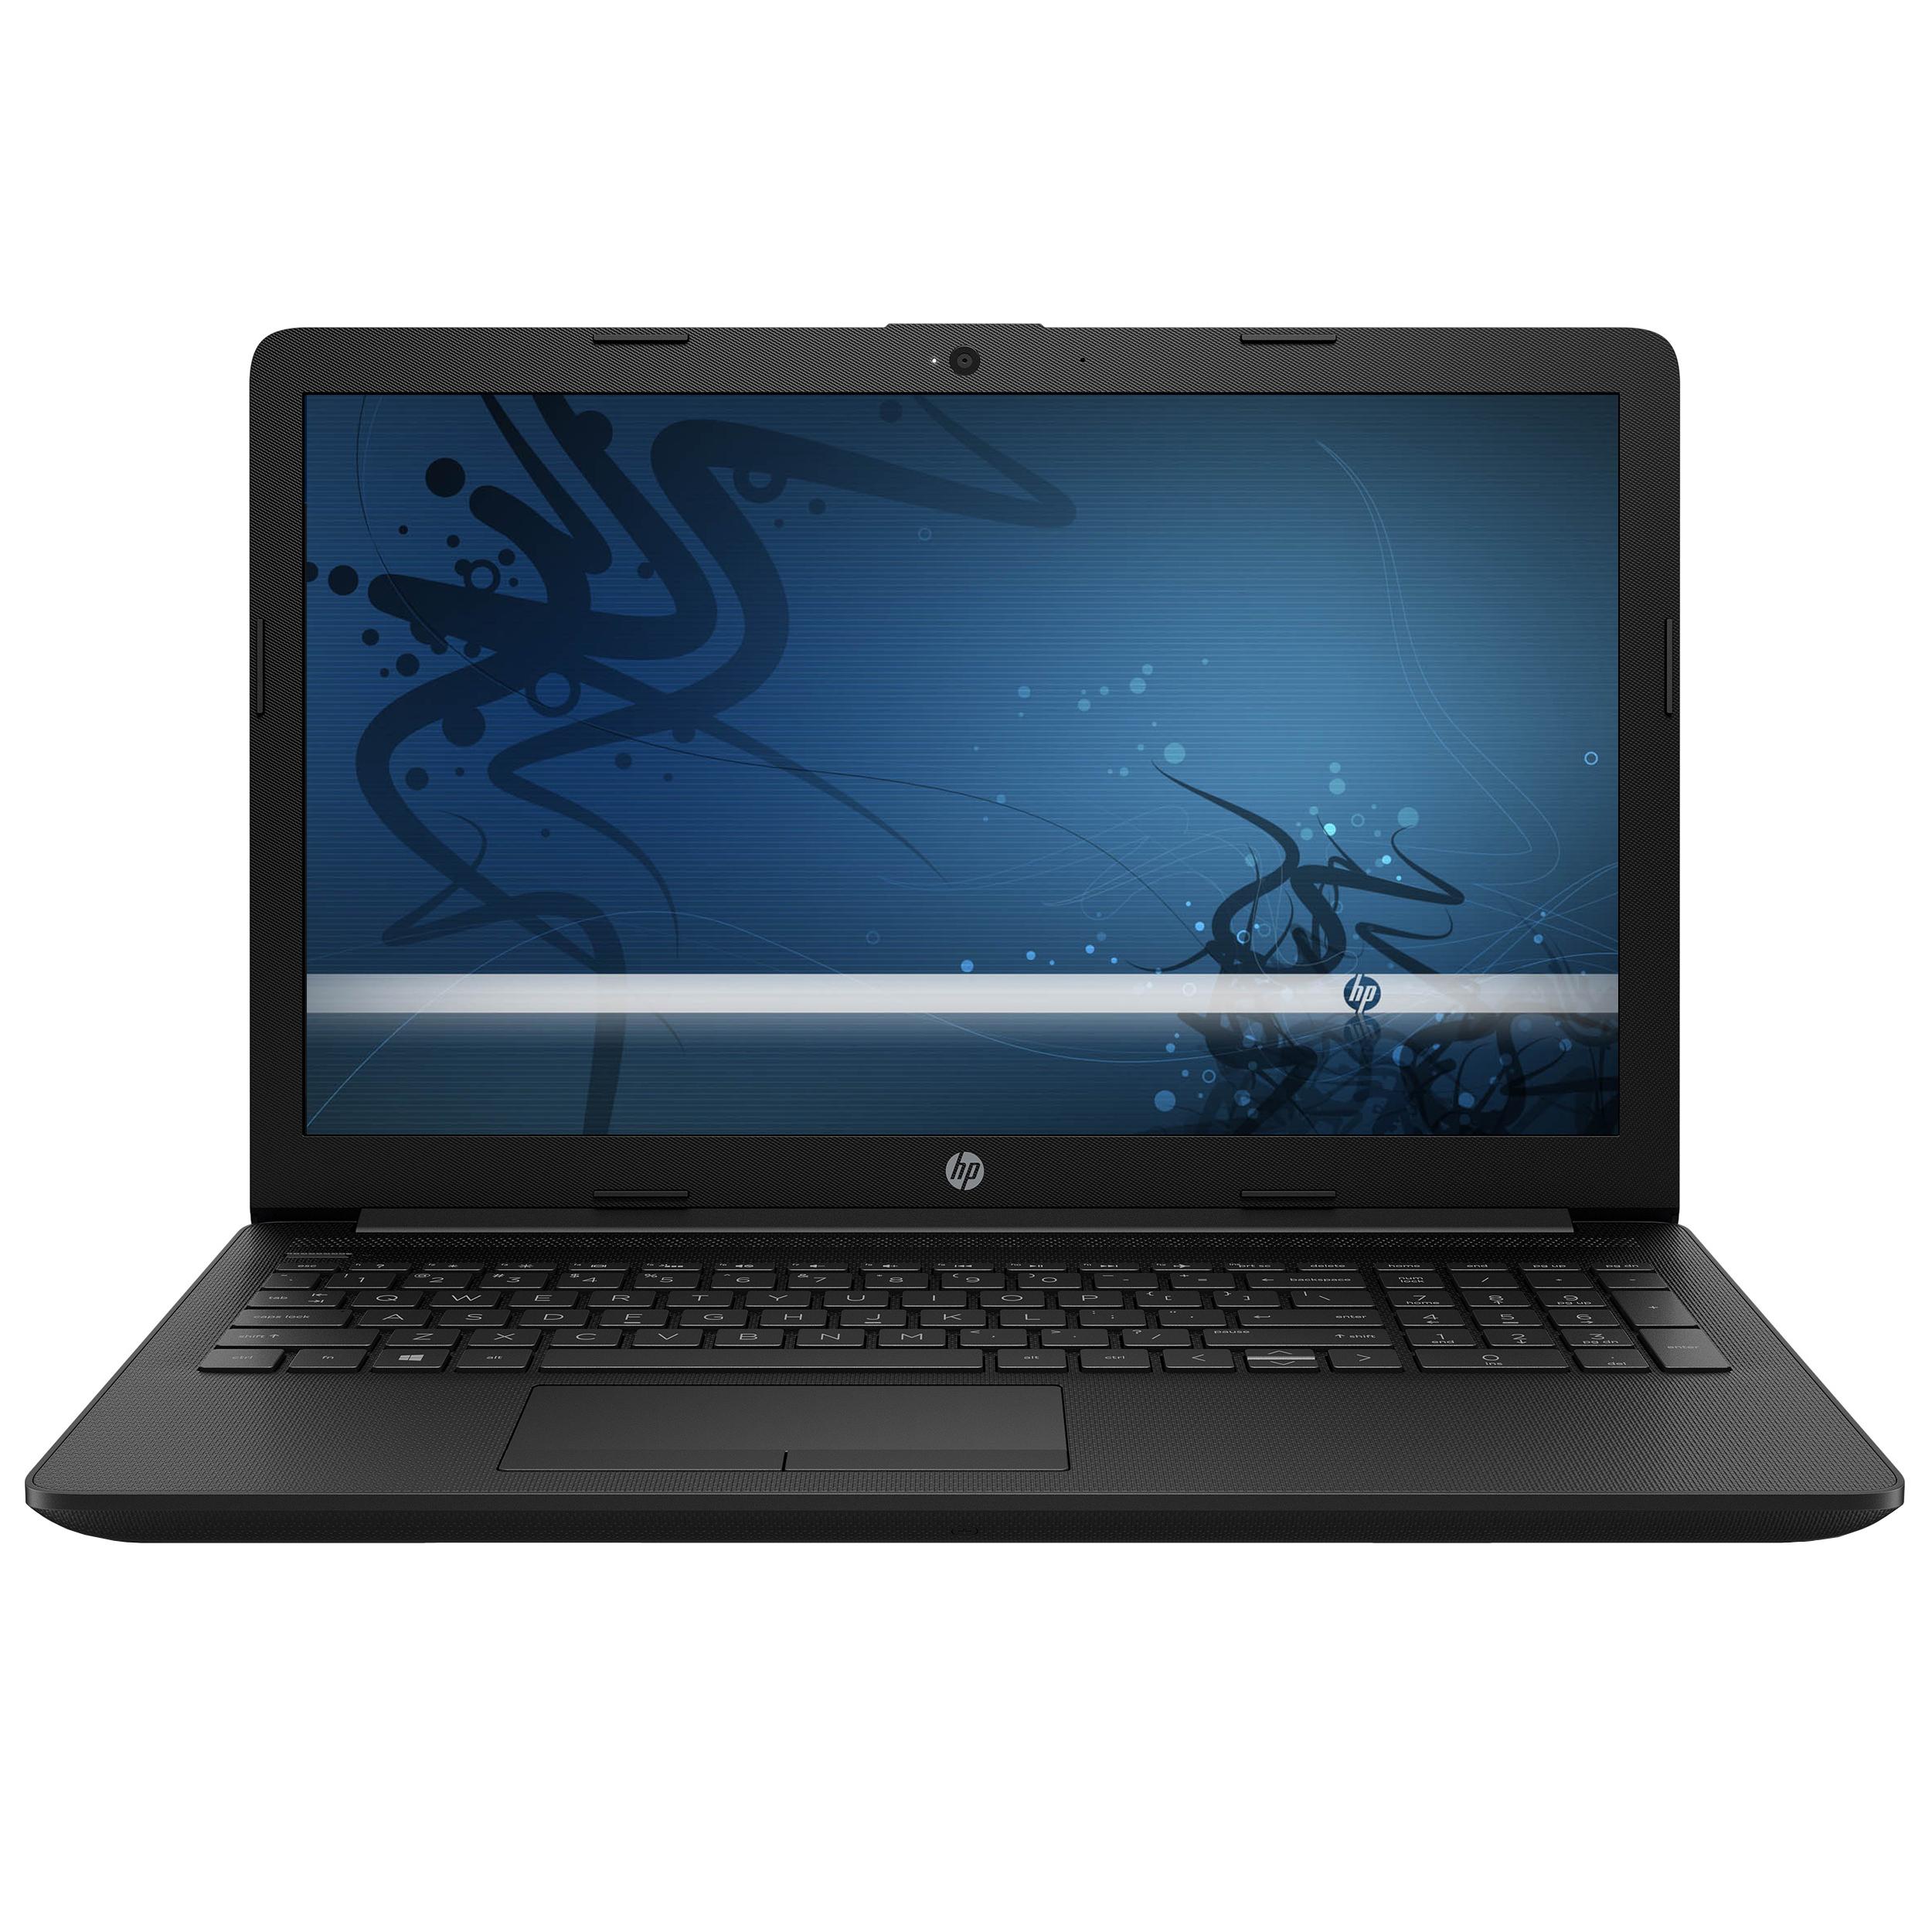 لپ تاپ ۱۵ اینچی اچ پی مدل DA2183-A